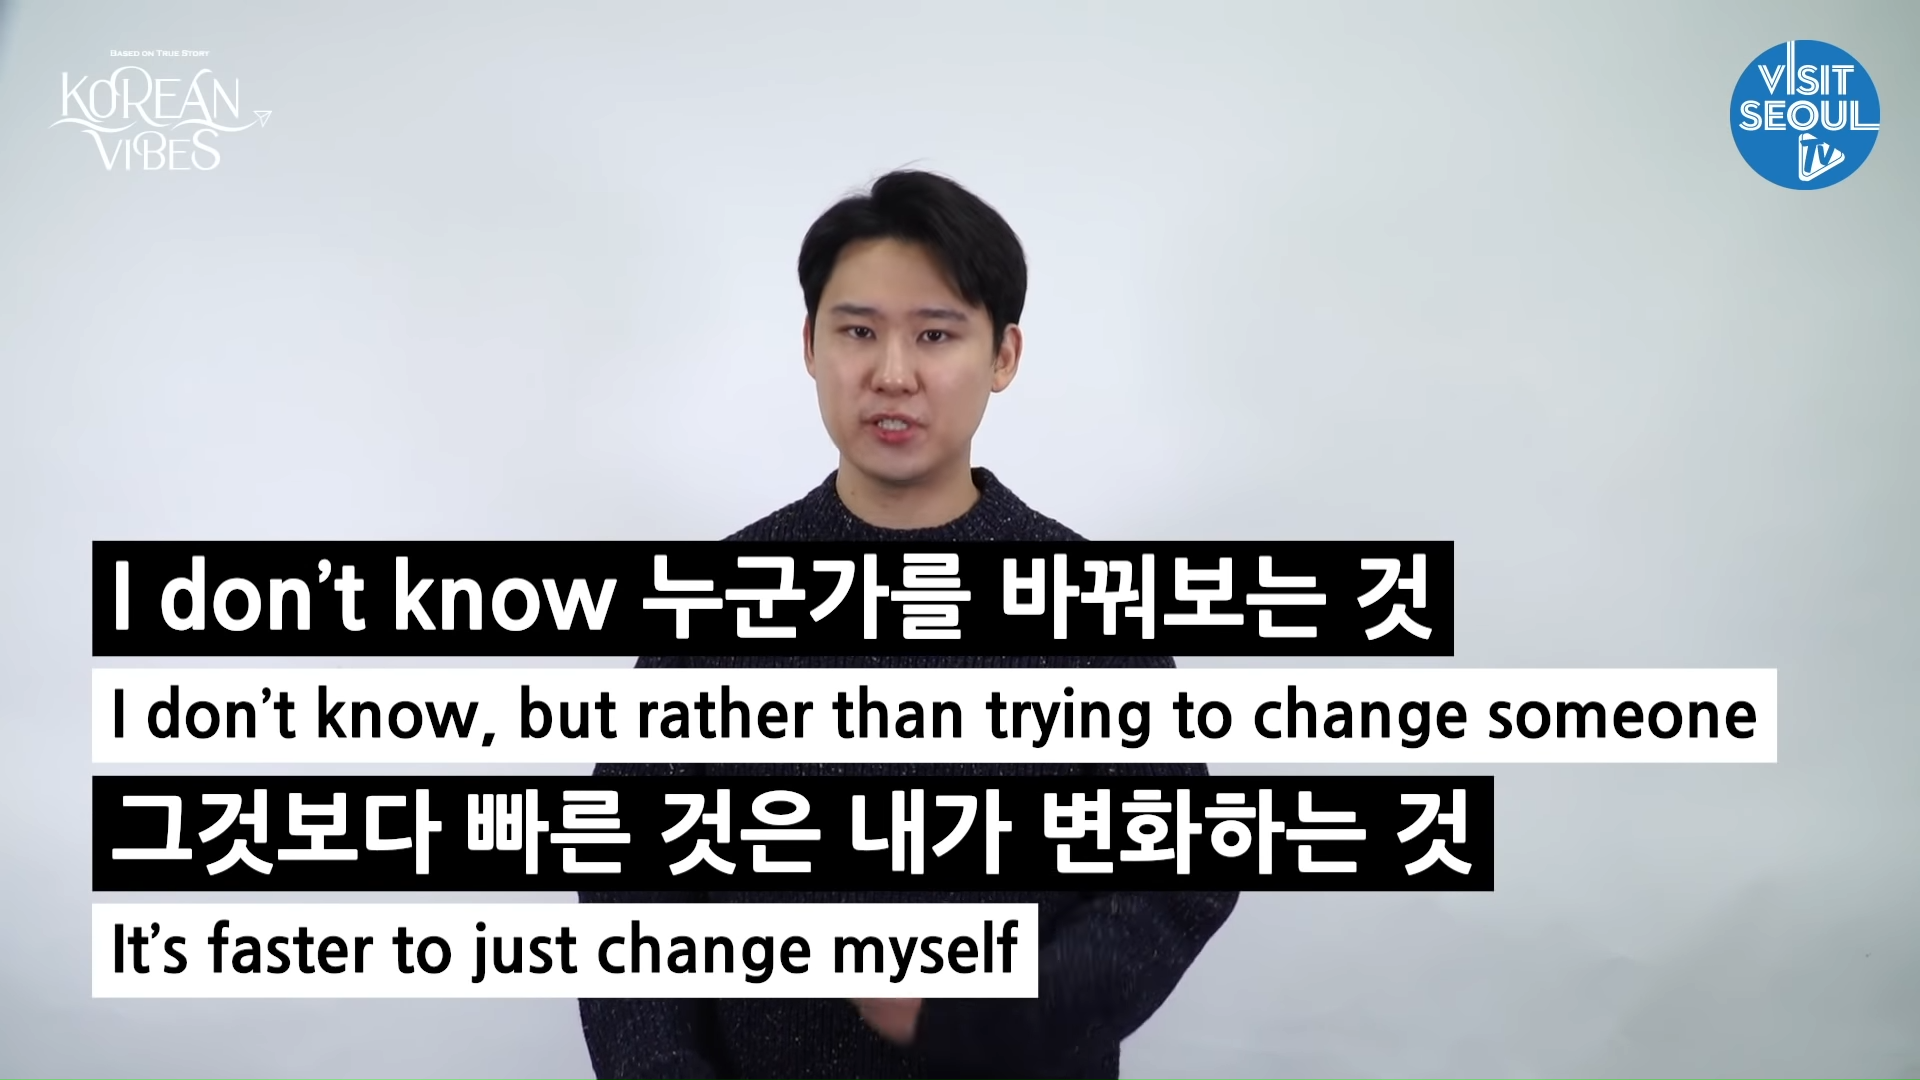 BTS - Dis-ease Explained by a Korean 9-19 screenshot